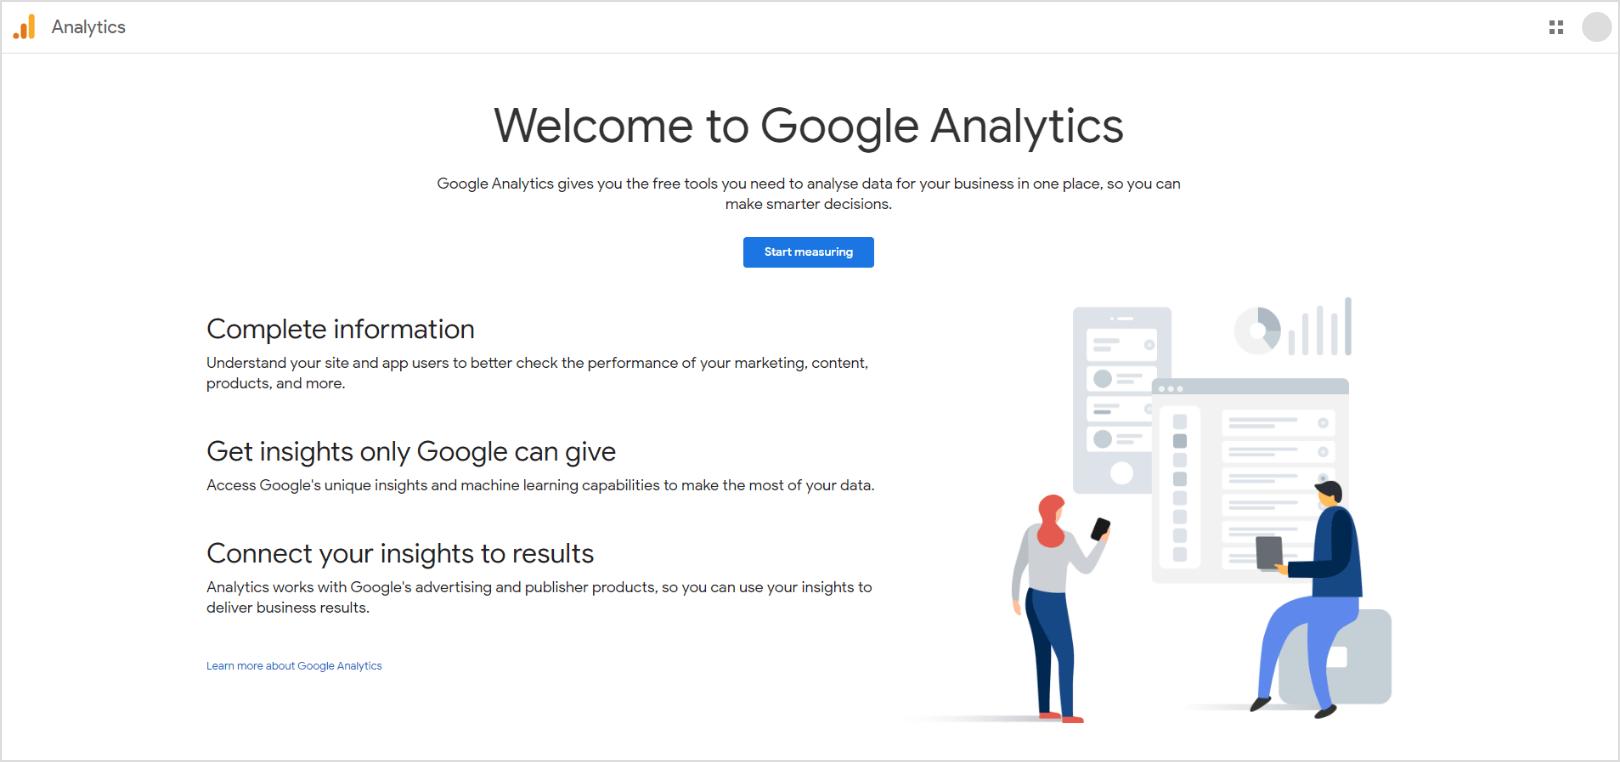 Google-Analytics-Home-Page